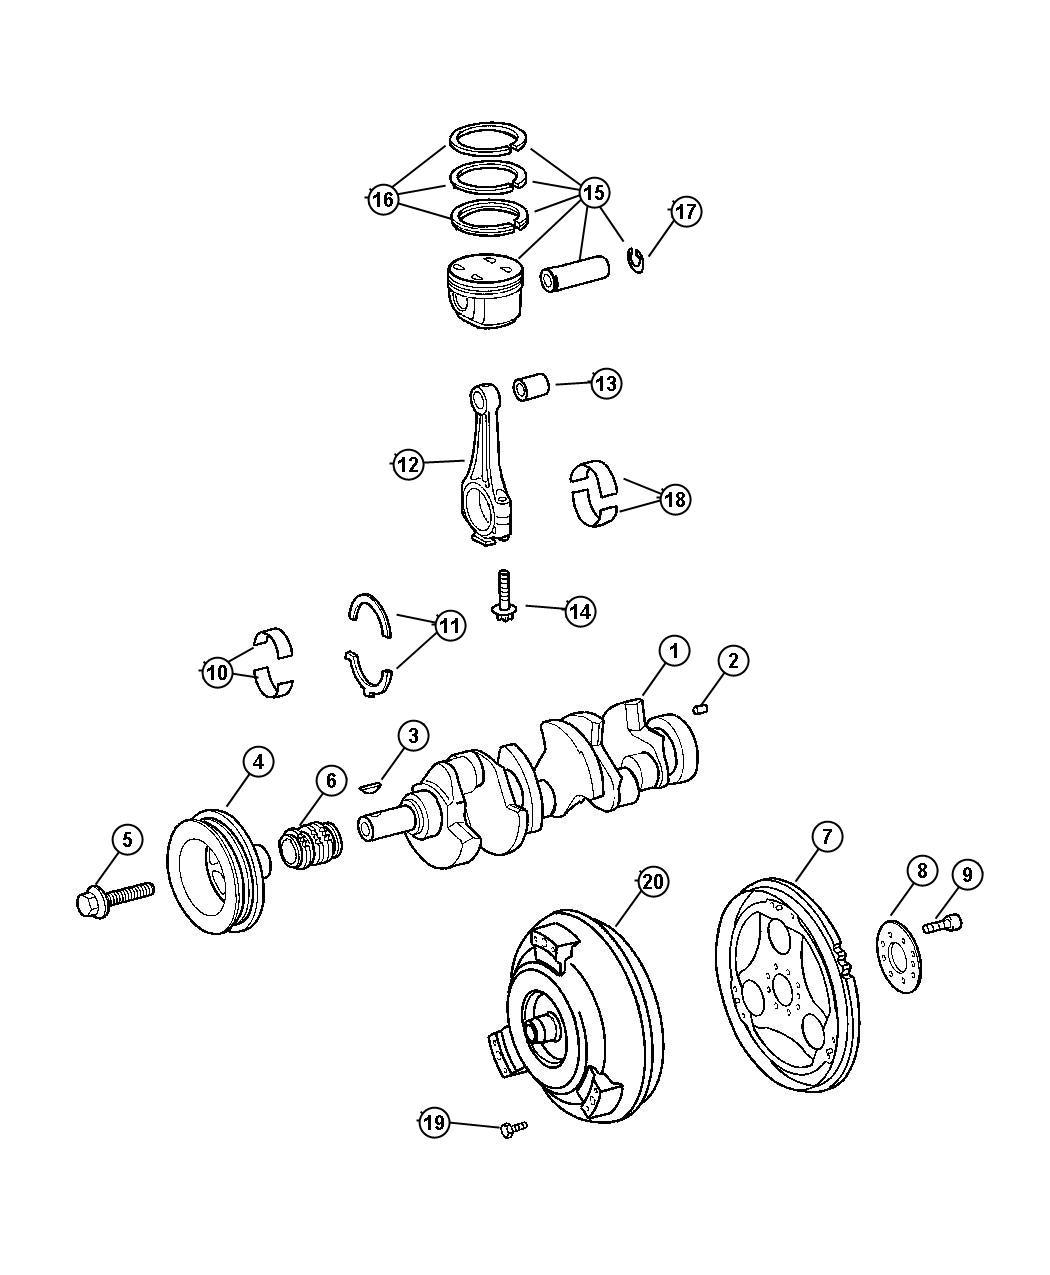 Chrysler Crossfire Dowel, dowel pin. Diesel, crankshaft